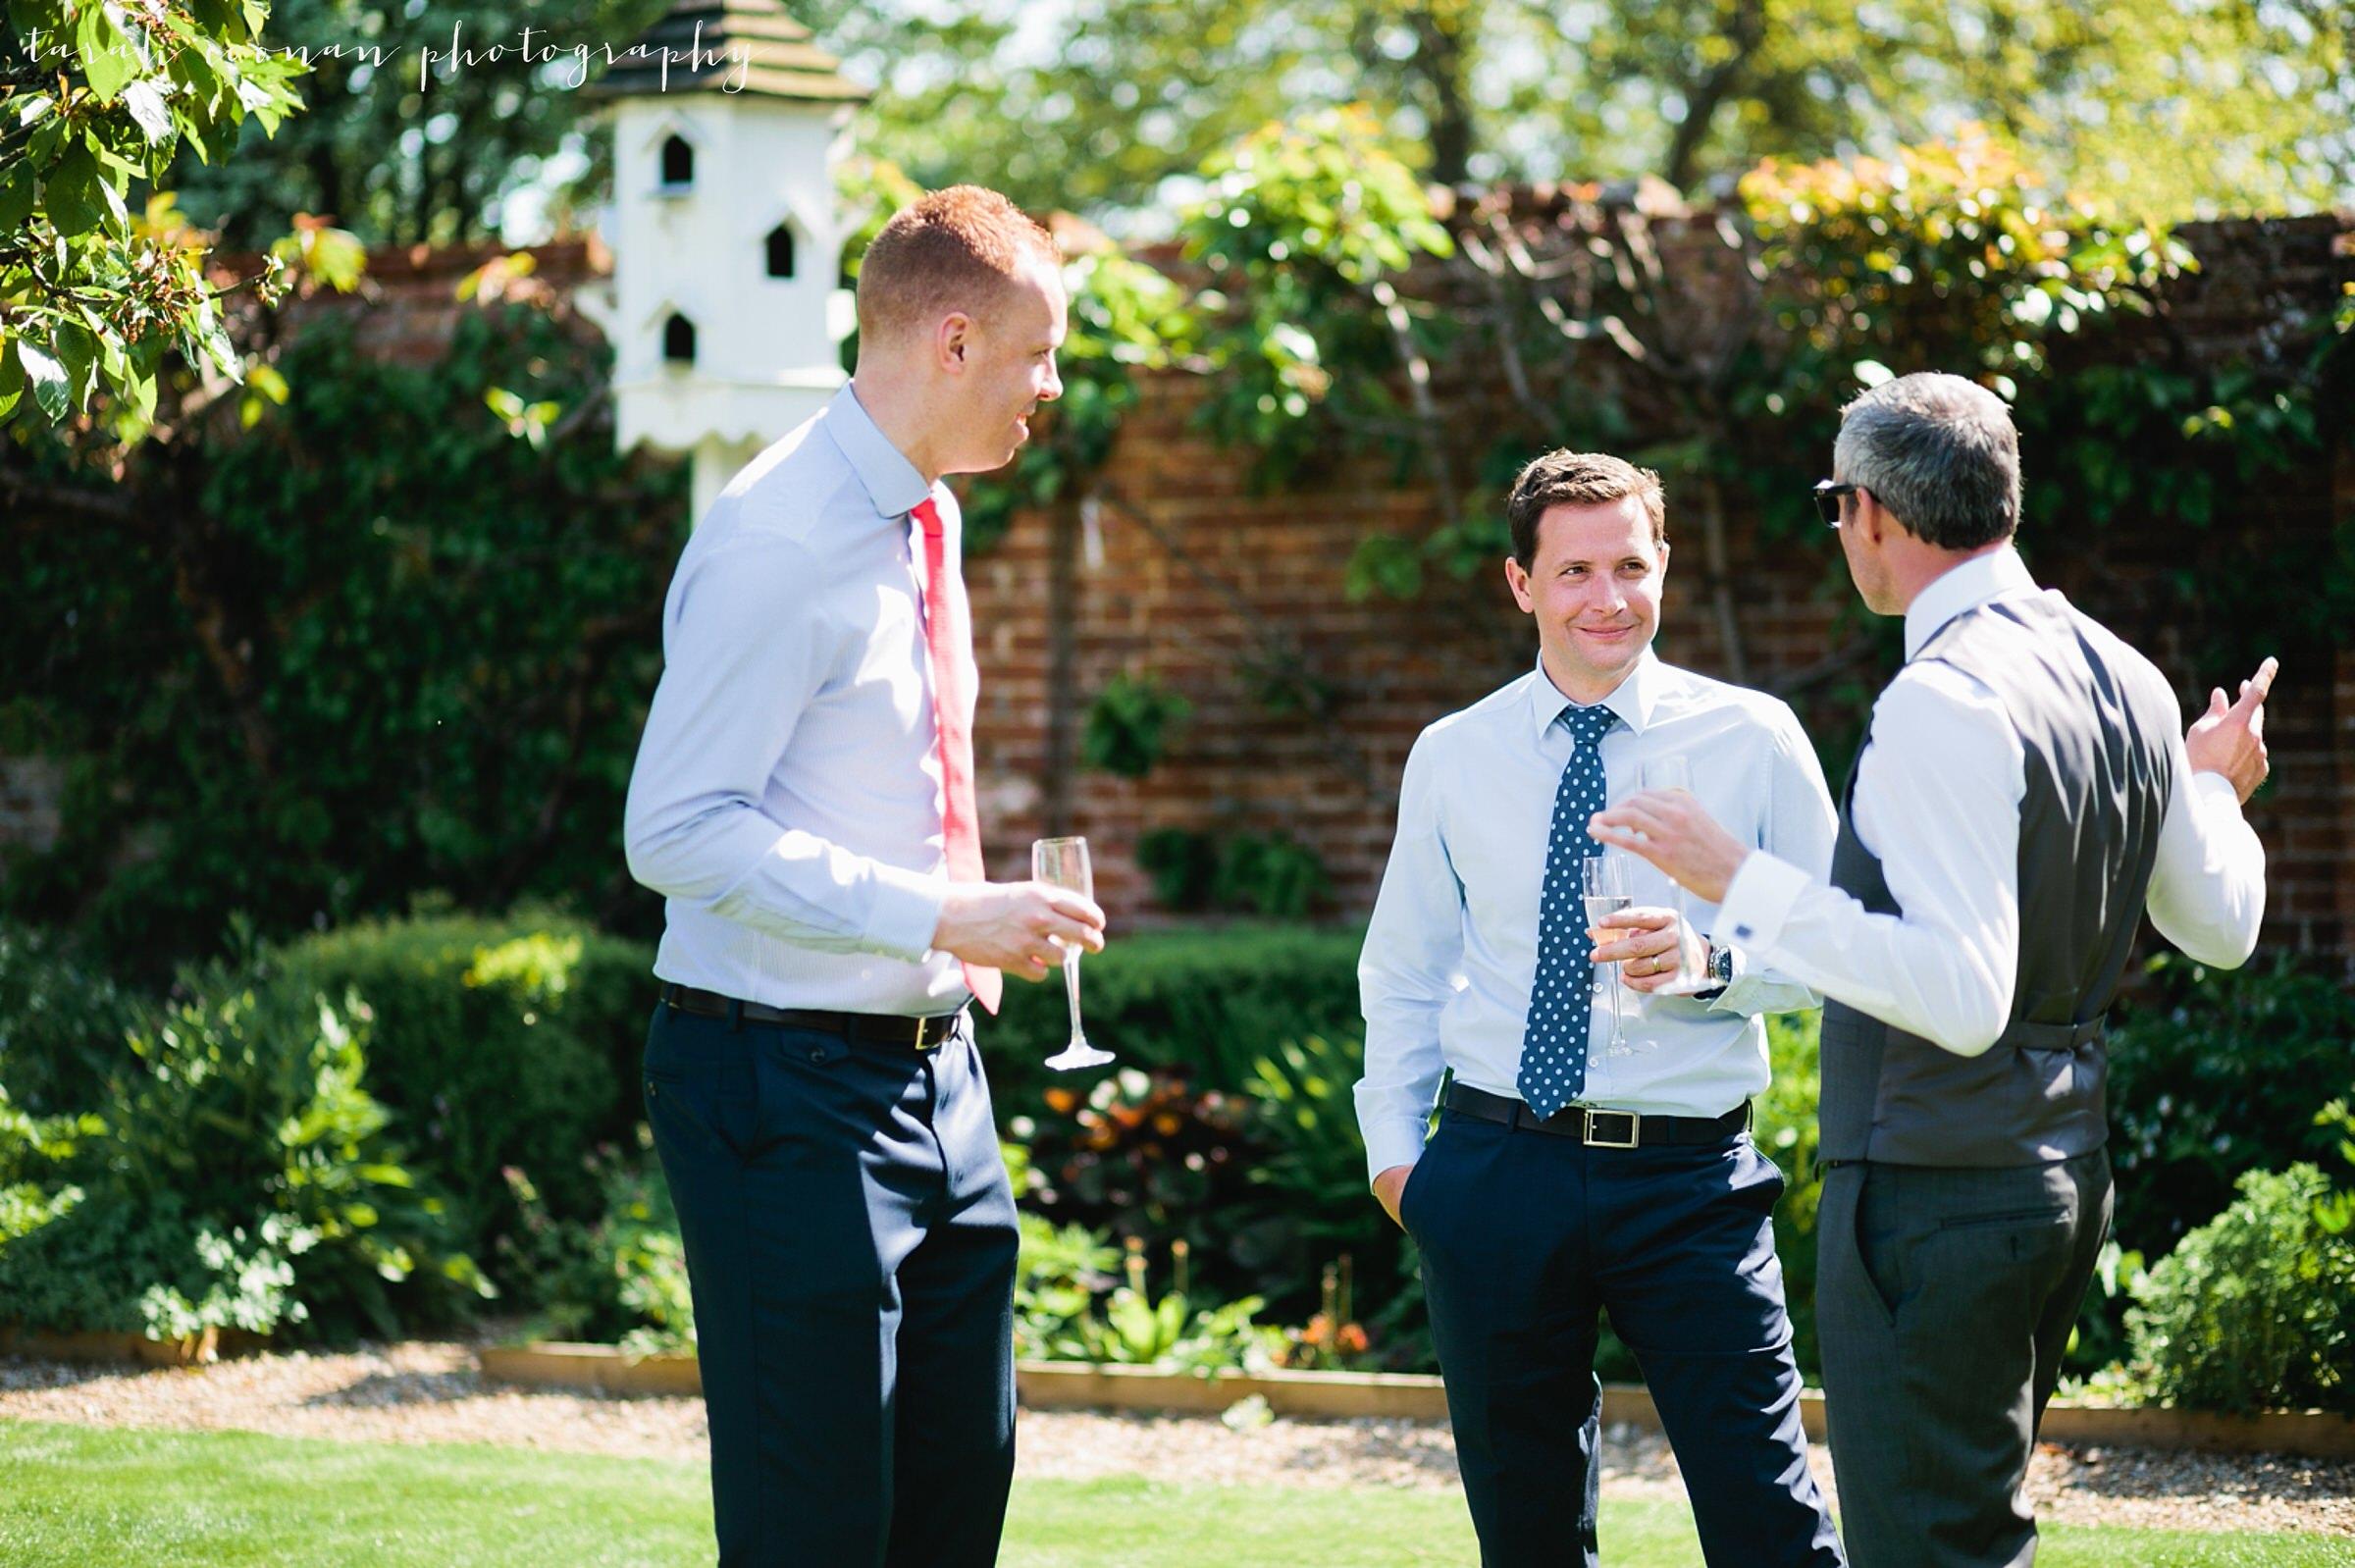 northbrook-park-wedding-photographer_060